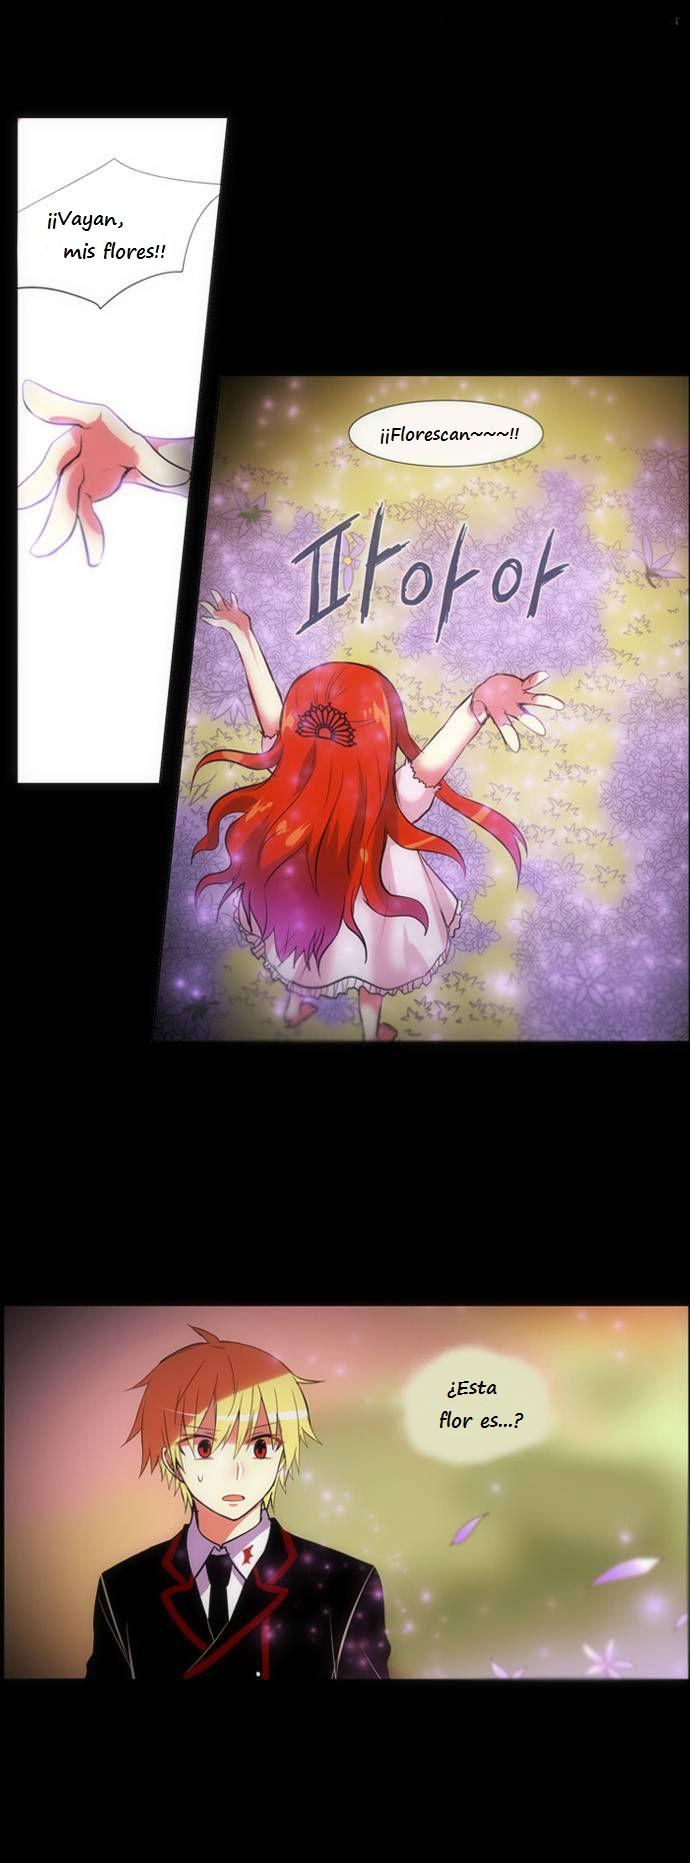 http://c5.ninemanga.com/es_manga/4/836/384796/3f6a3e341d031f437df637c96f686c43.jpg Page 4